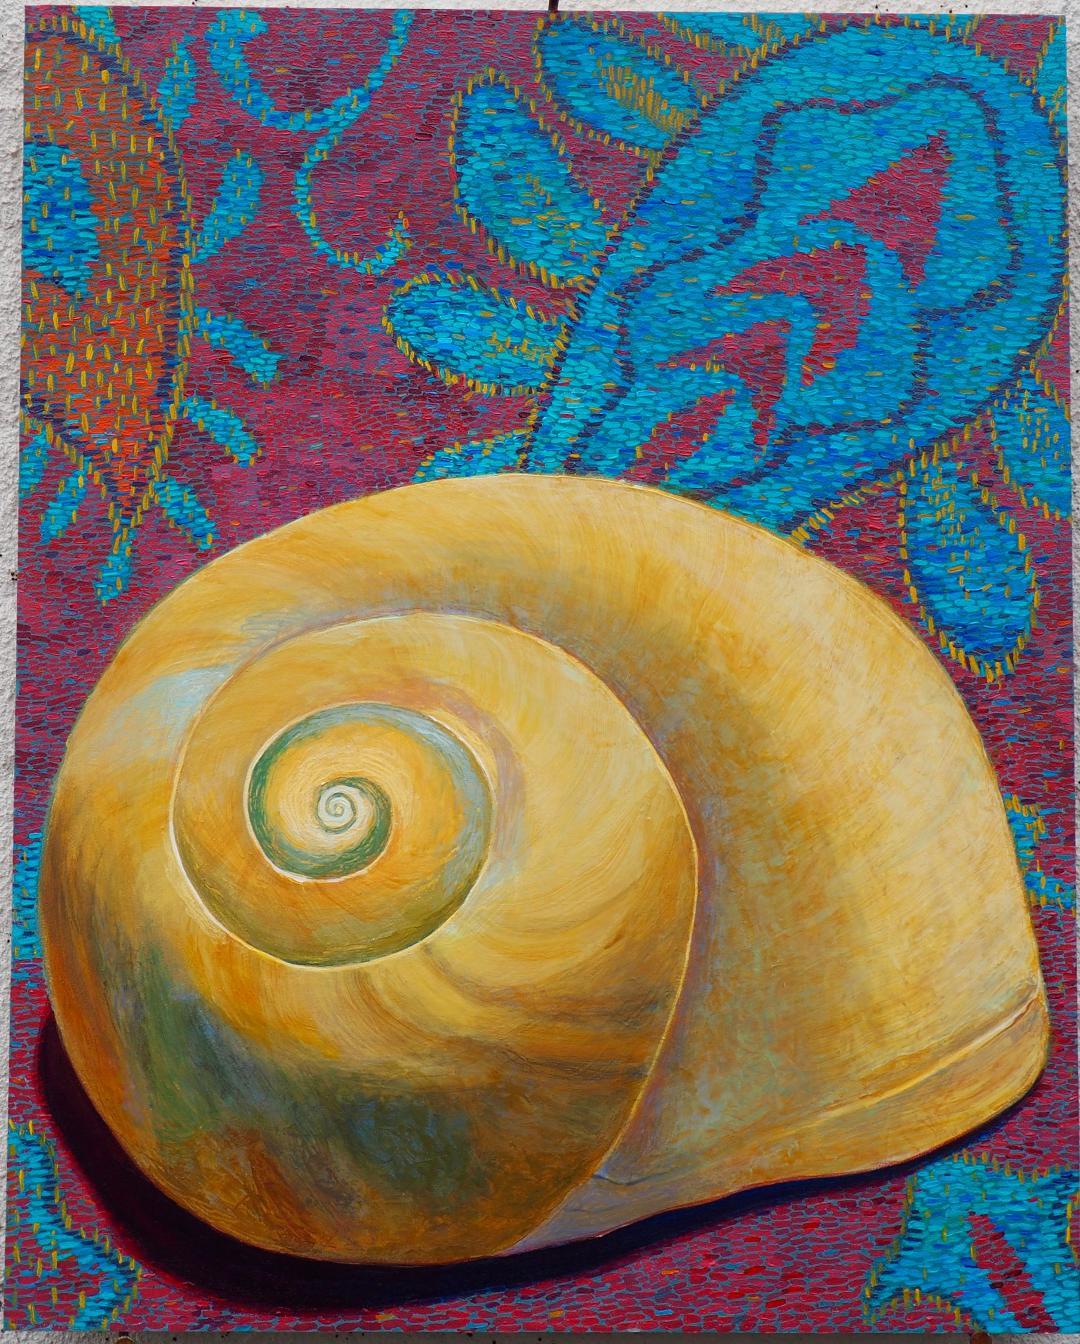 "Daniel Schroeder,   Moon Snail  , Acrylic on Panel, 16"" x 20"", 2018"